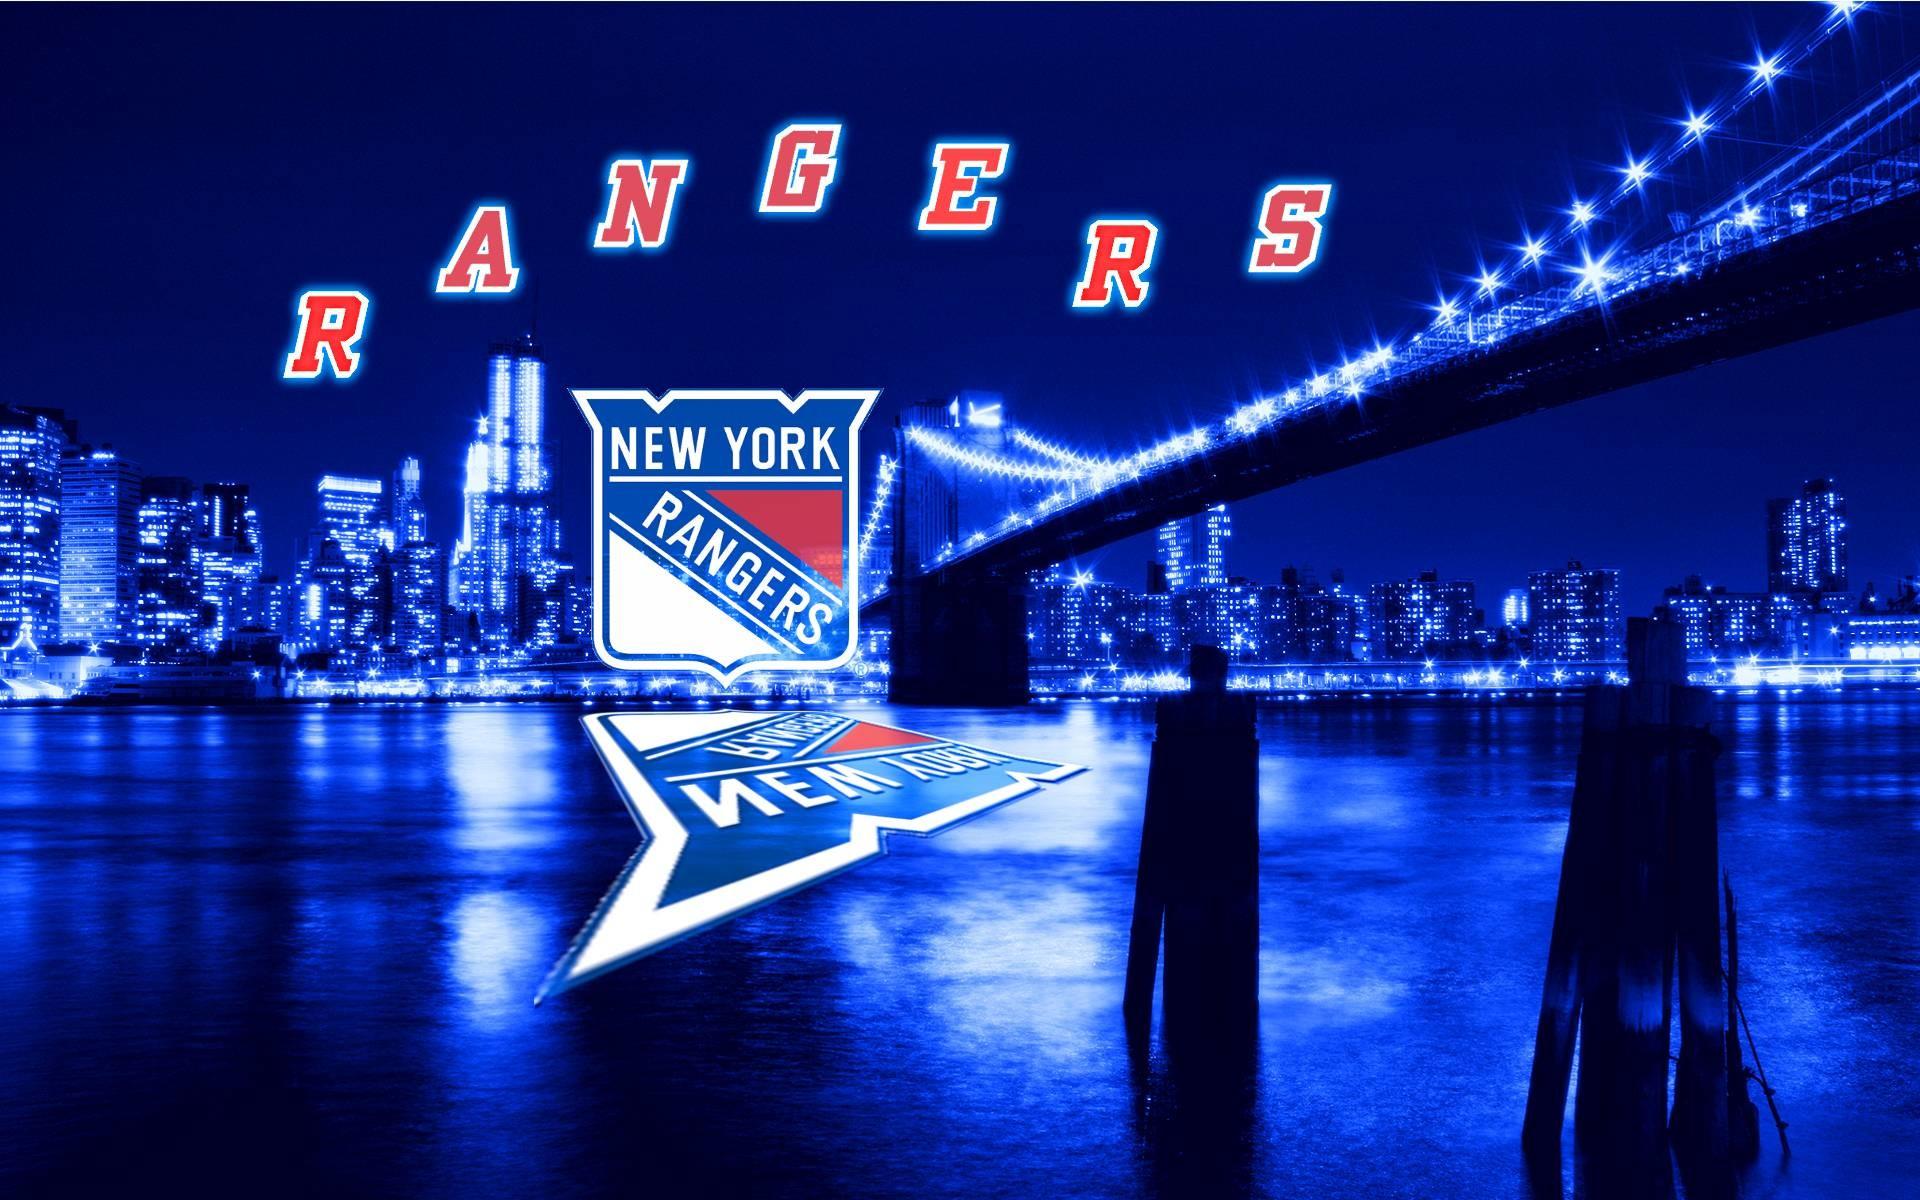 New York Rangers Wallpapers – Full HD wallpaper search